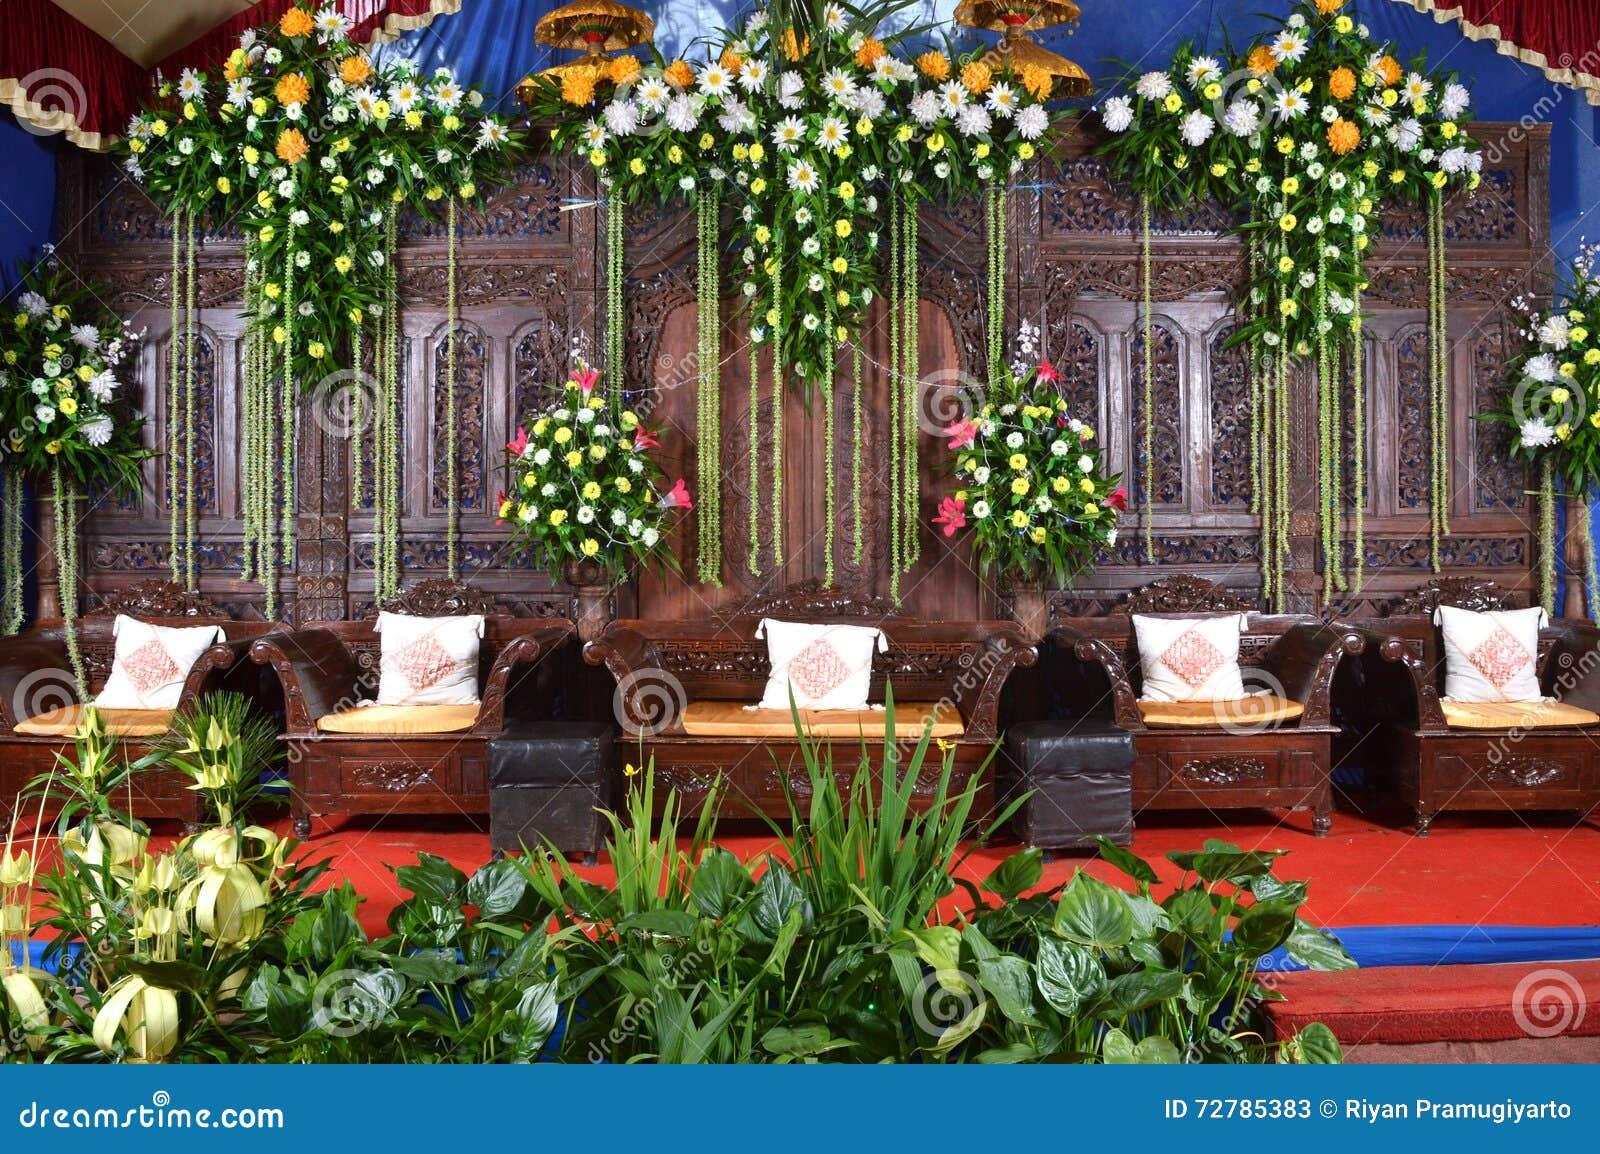 java wedding decoration dekorasi pernikahan jawa